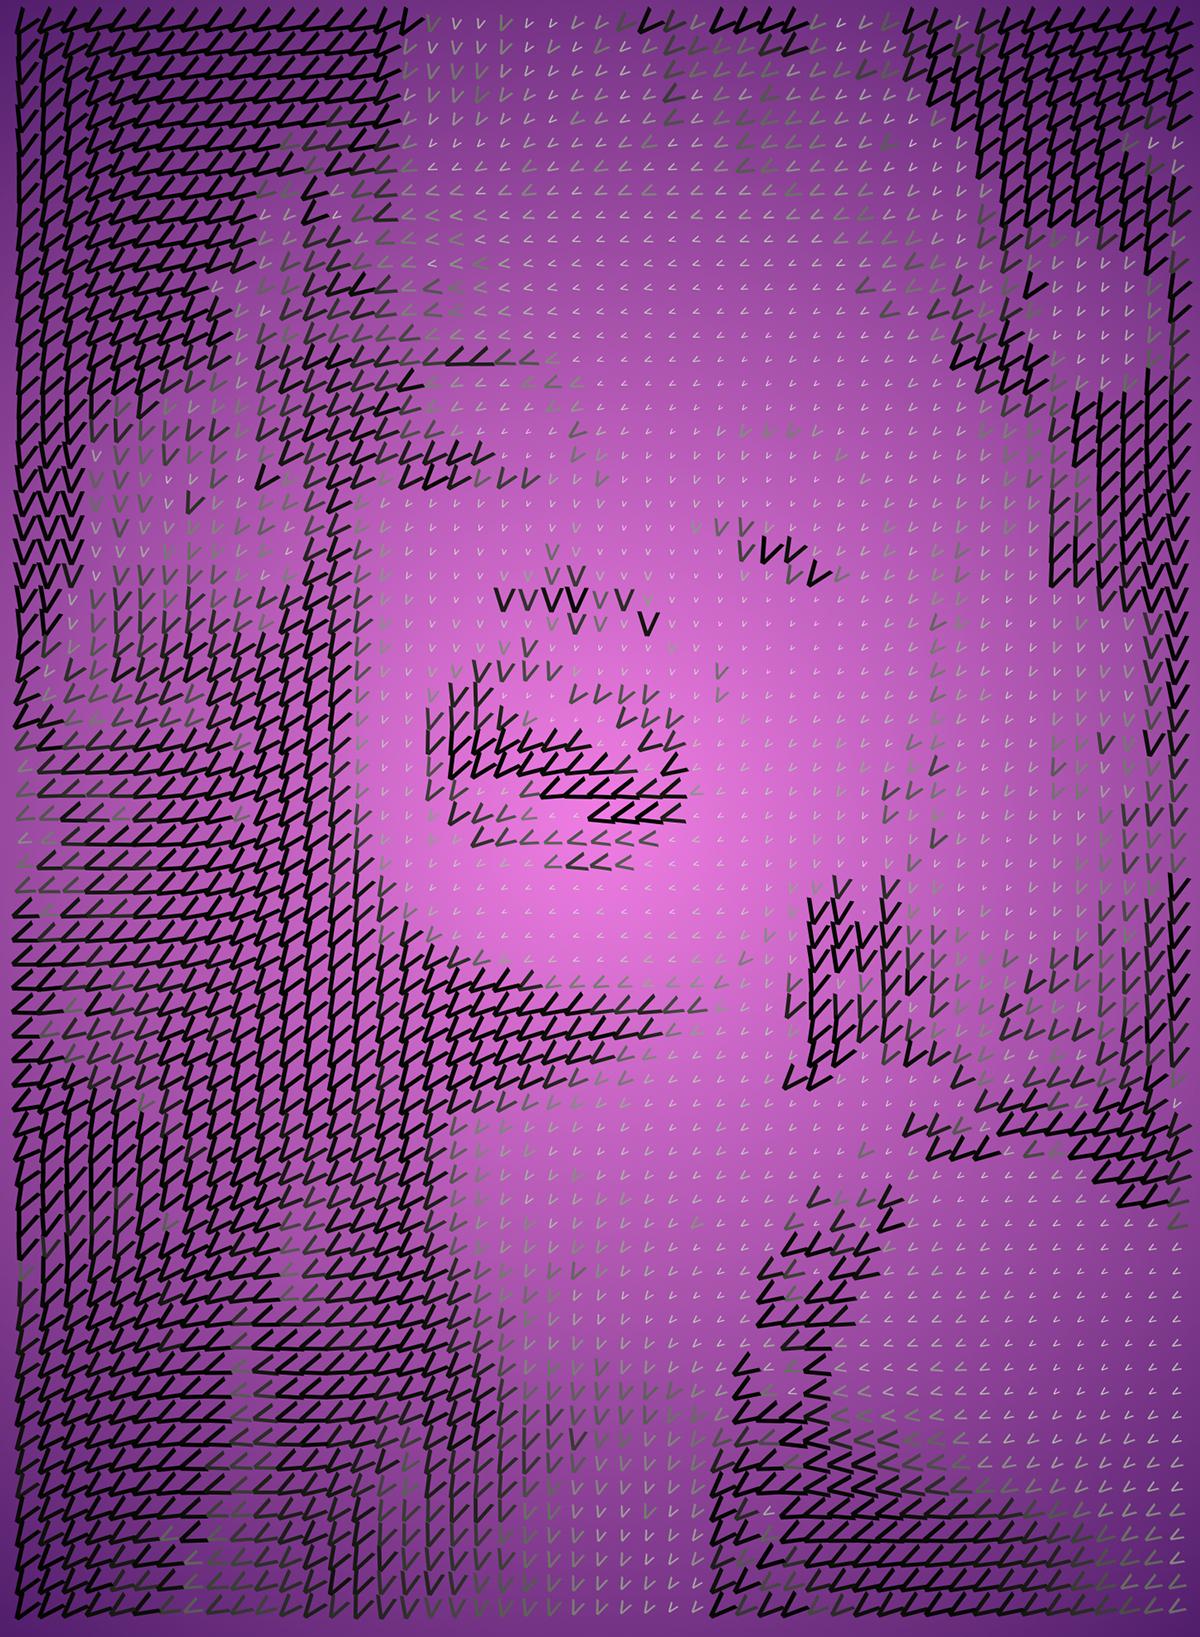 Shapeover ShapeoverArt VectorField galvanize ImageStudioProduction art design app